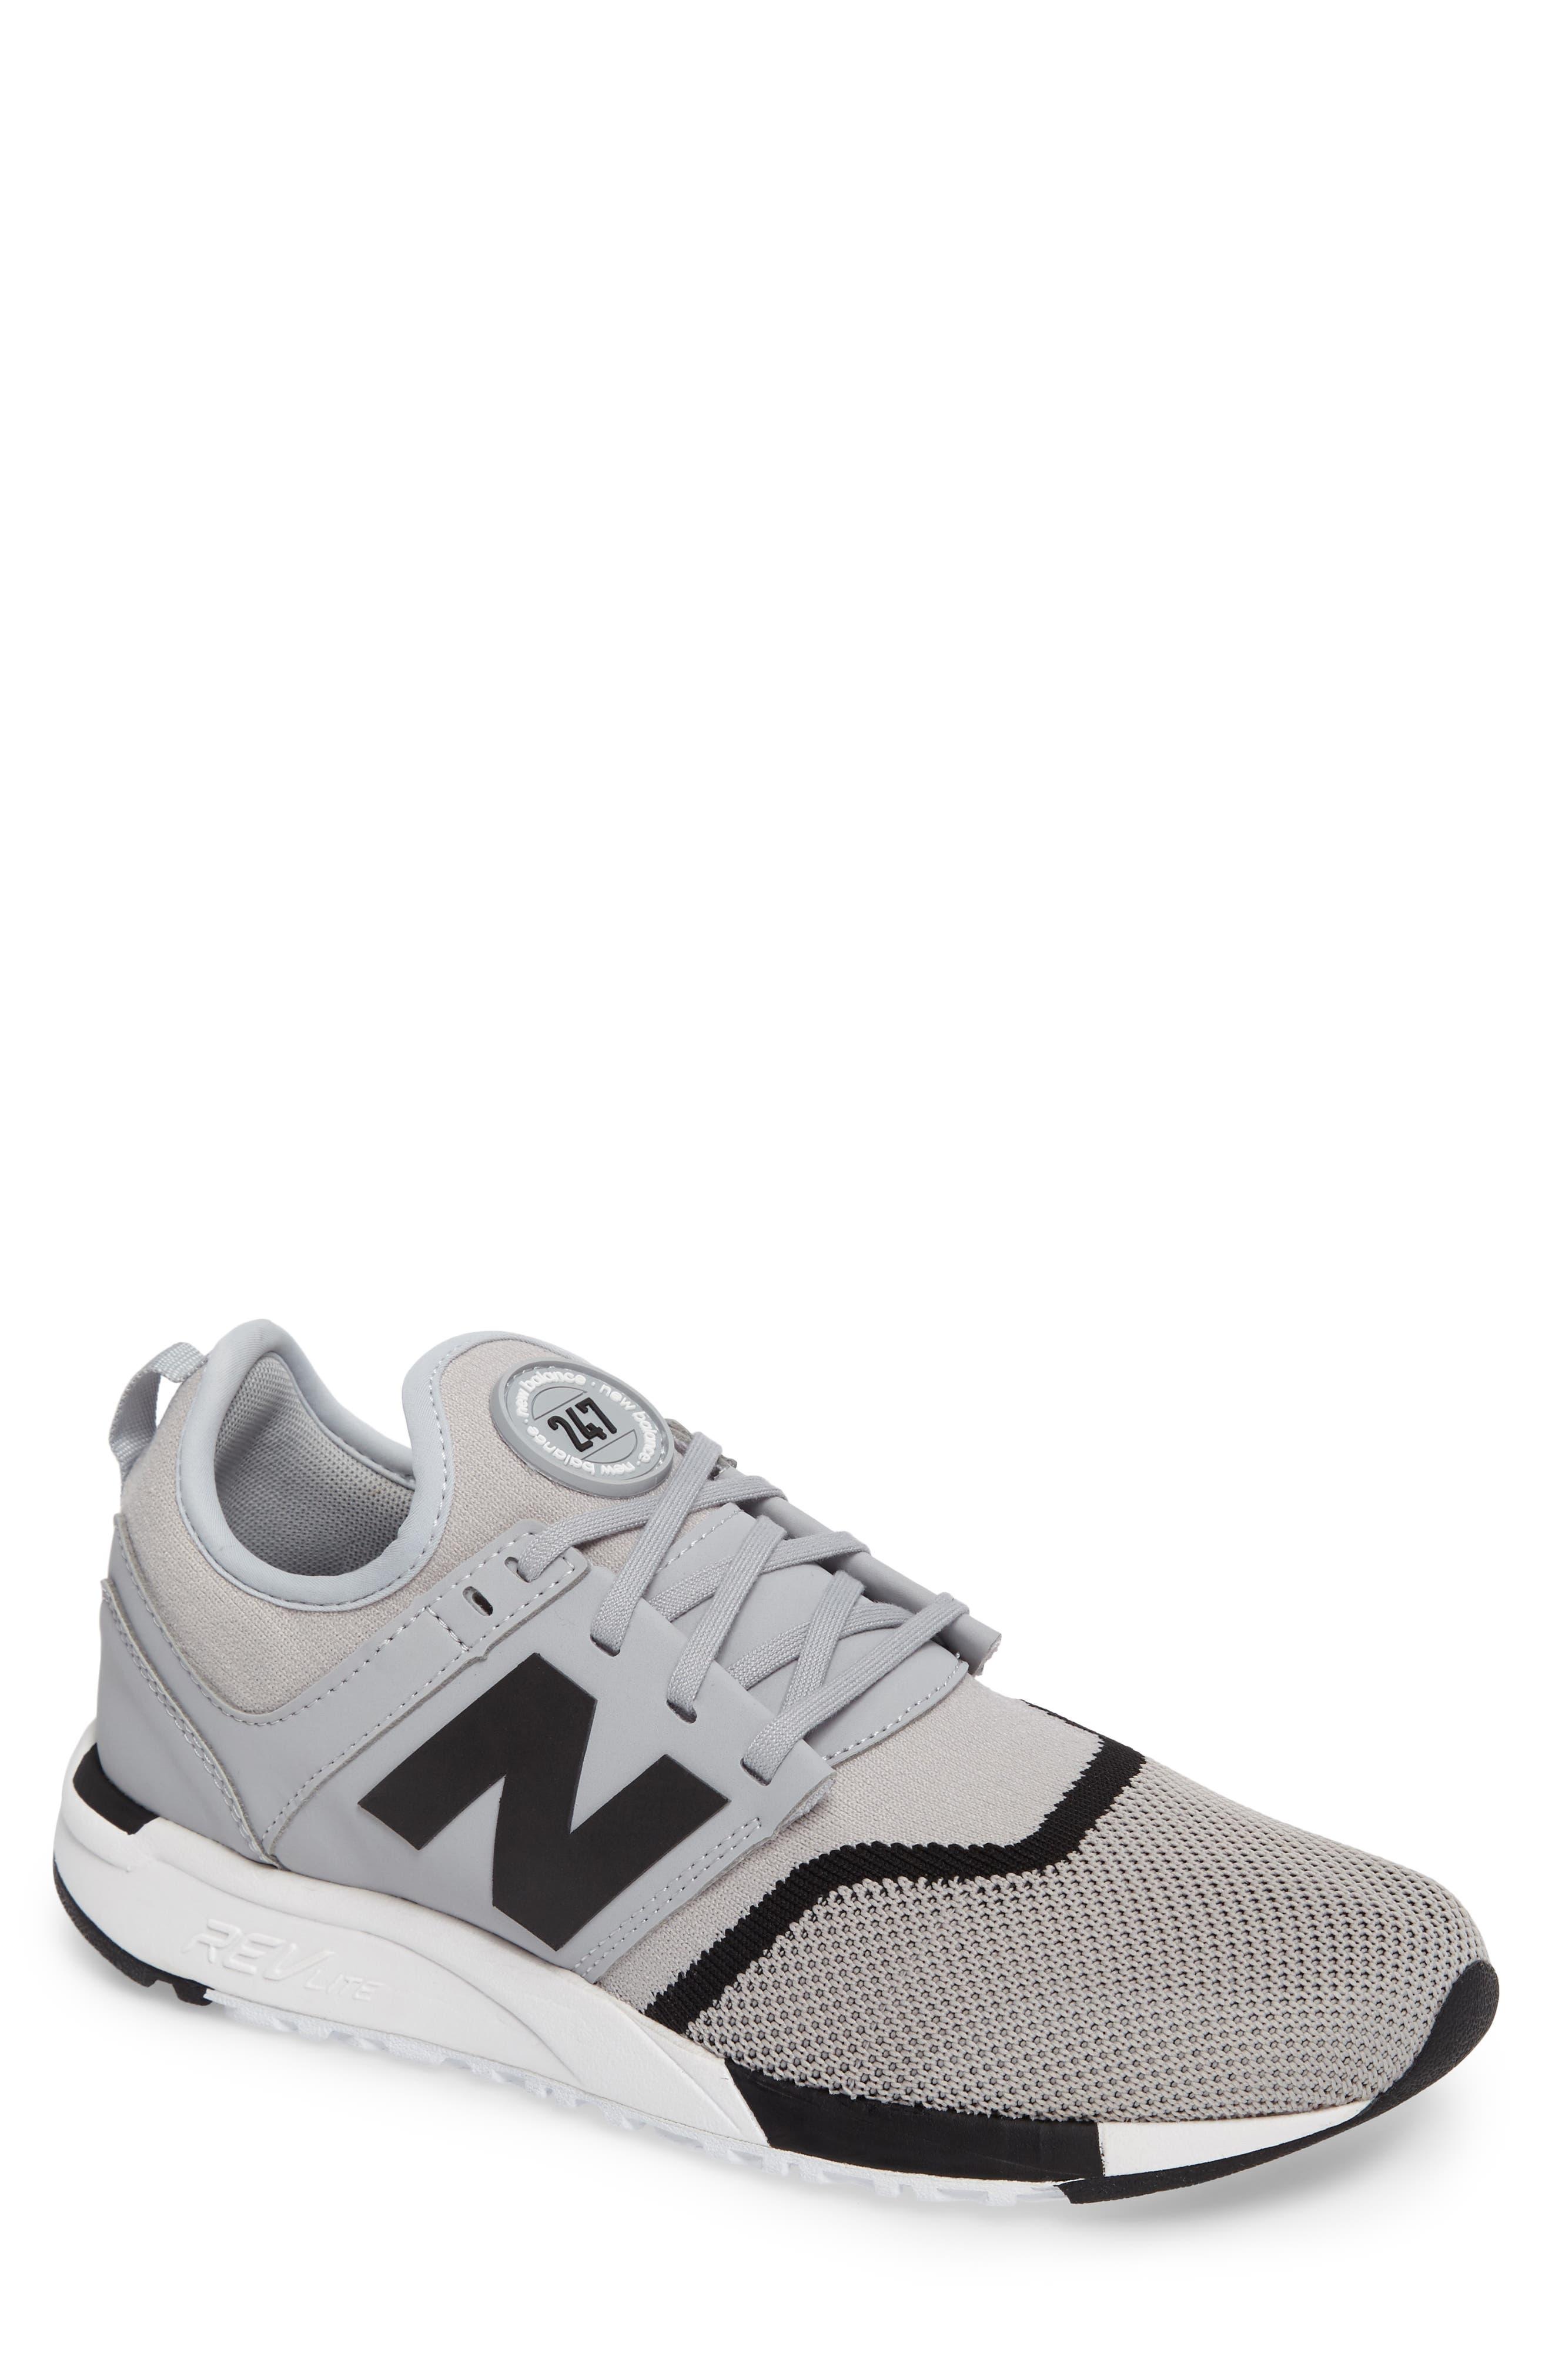 Main Image - New Balance 247 Sport Knit Sneaker (Men)